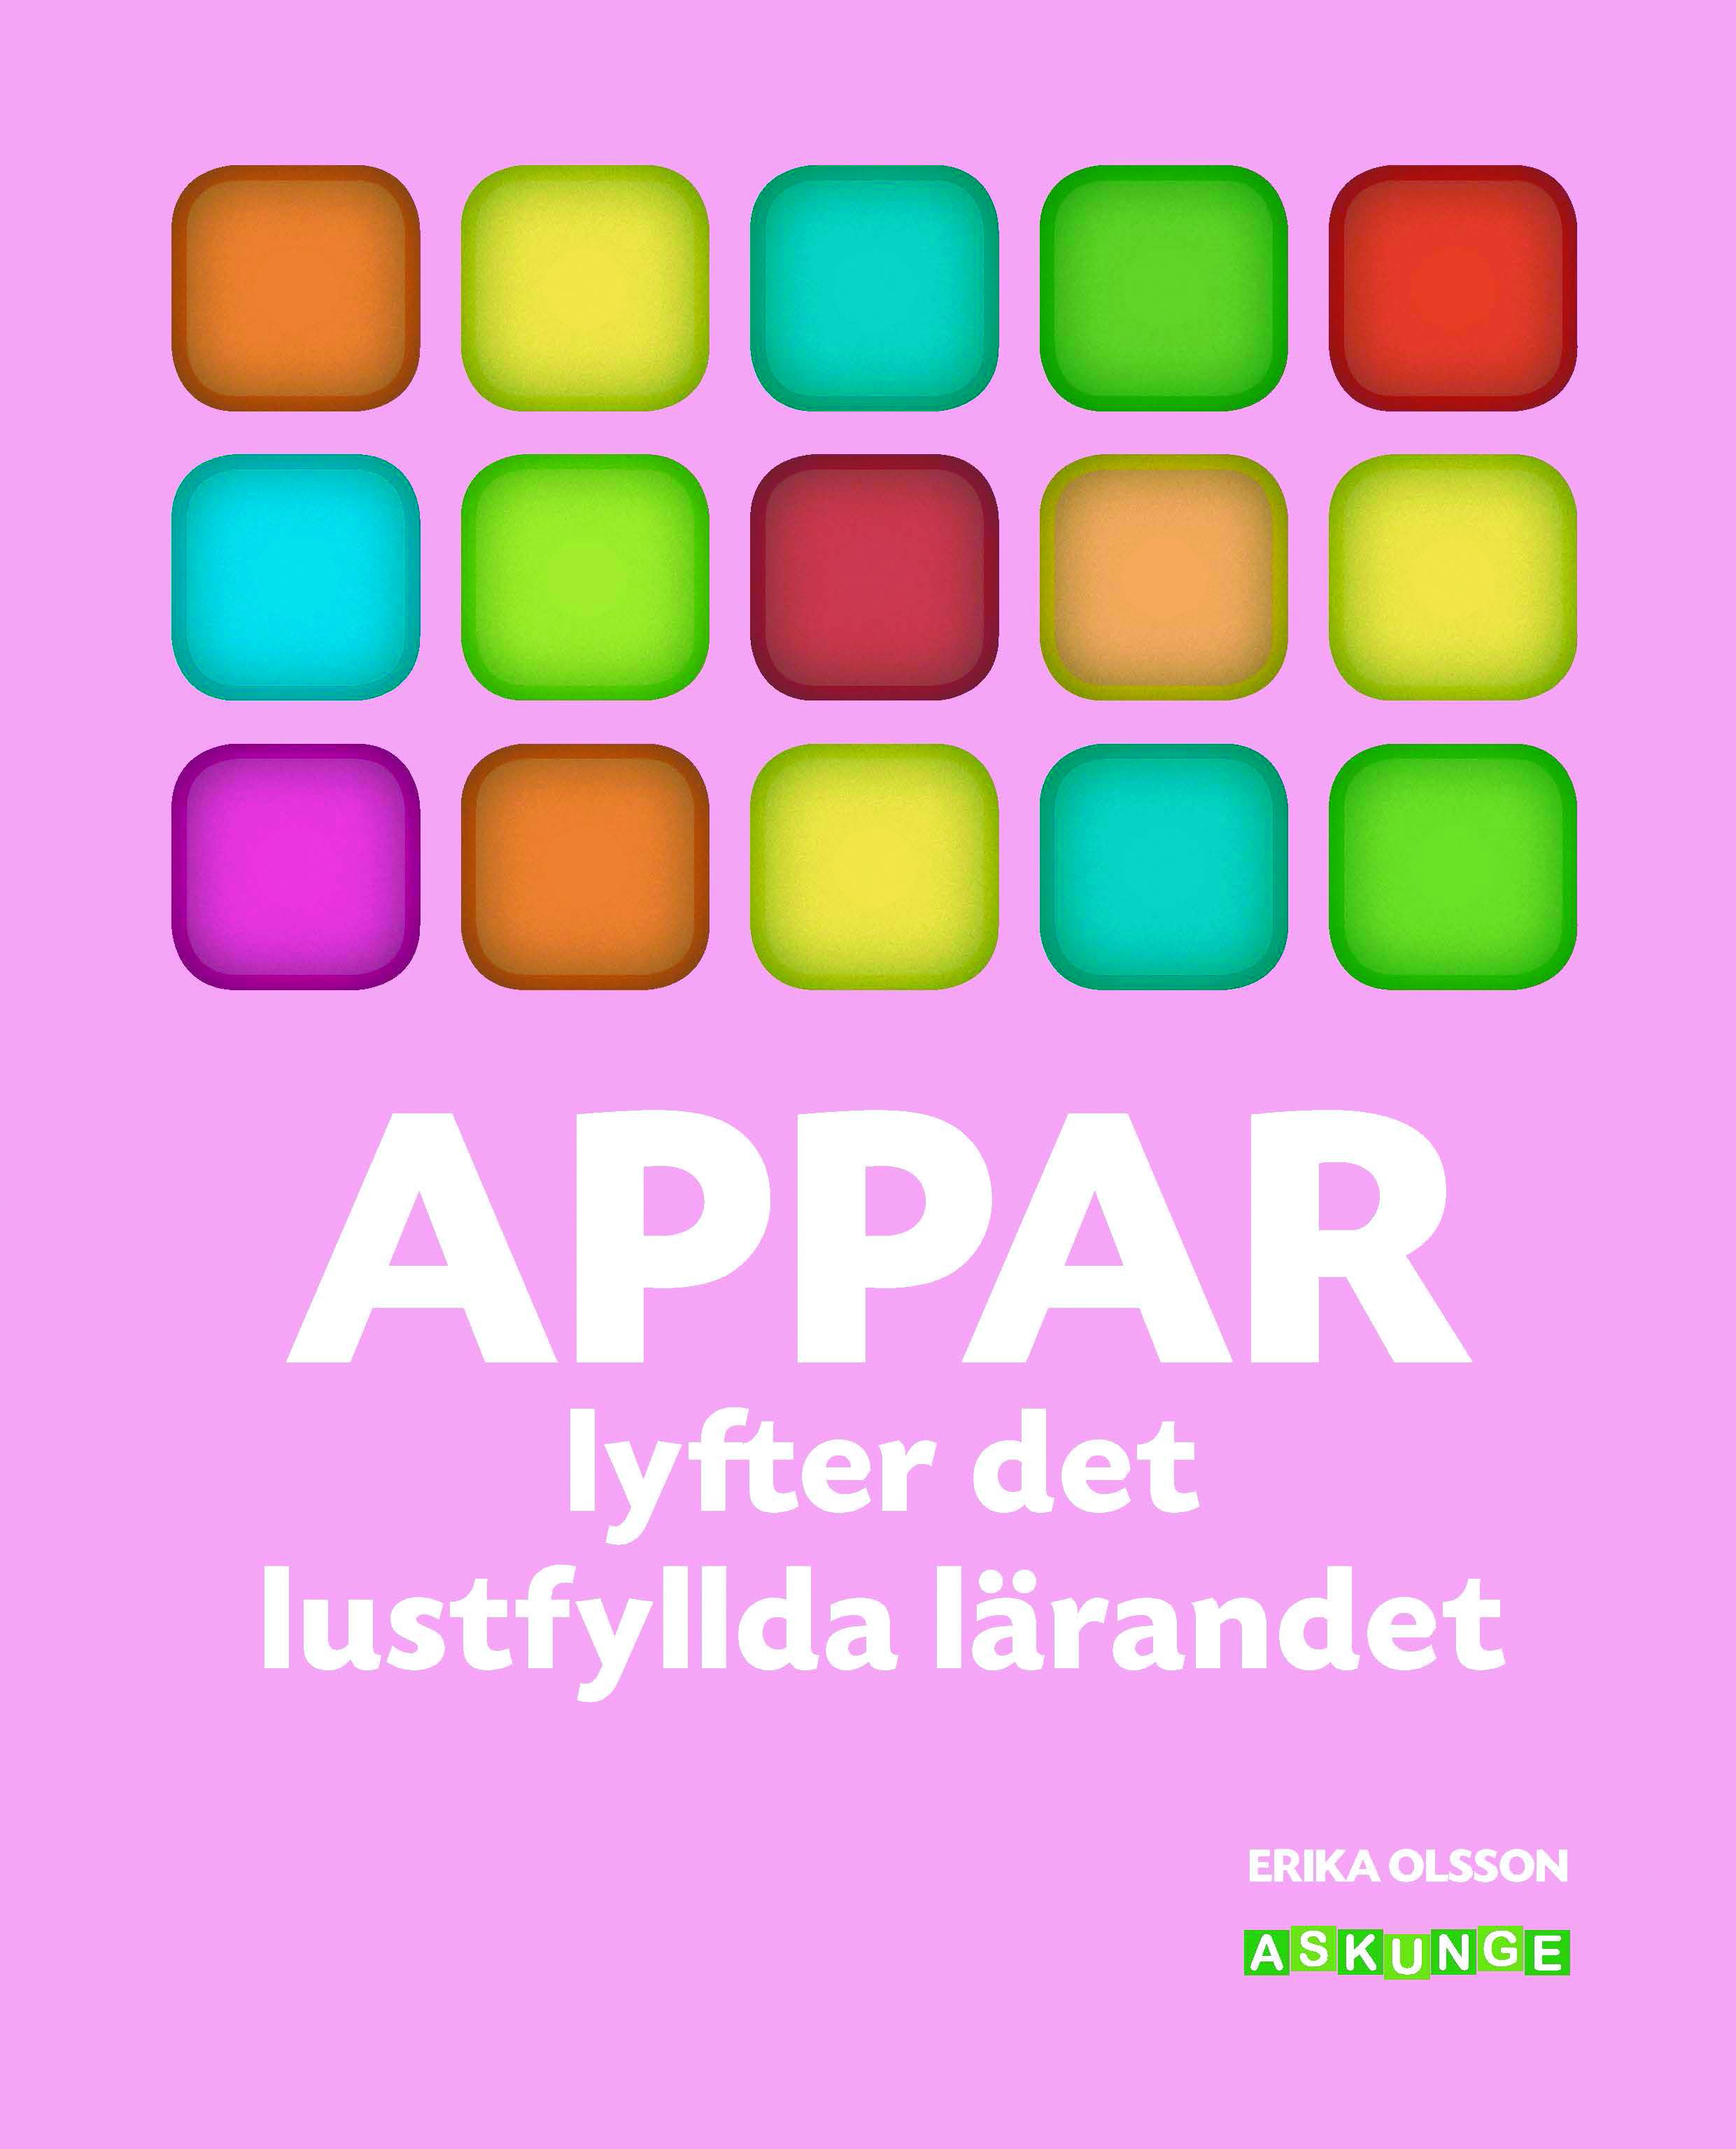 Appar